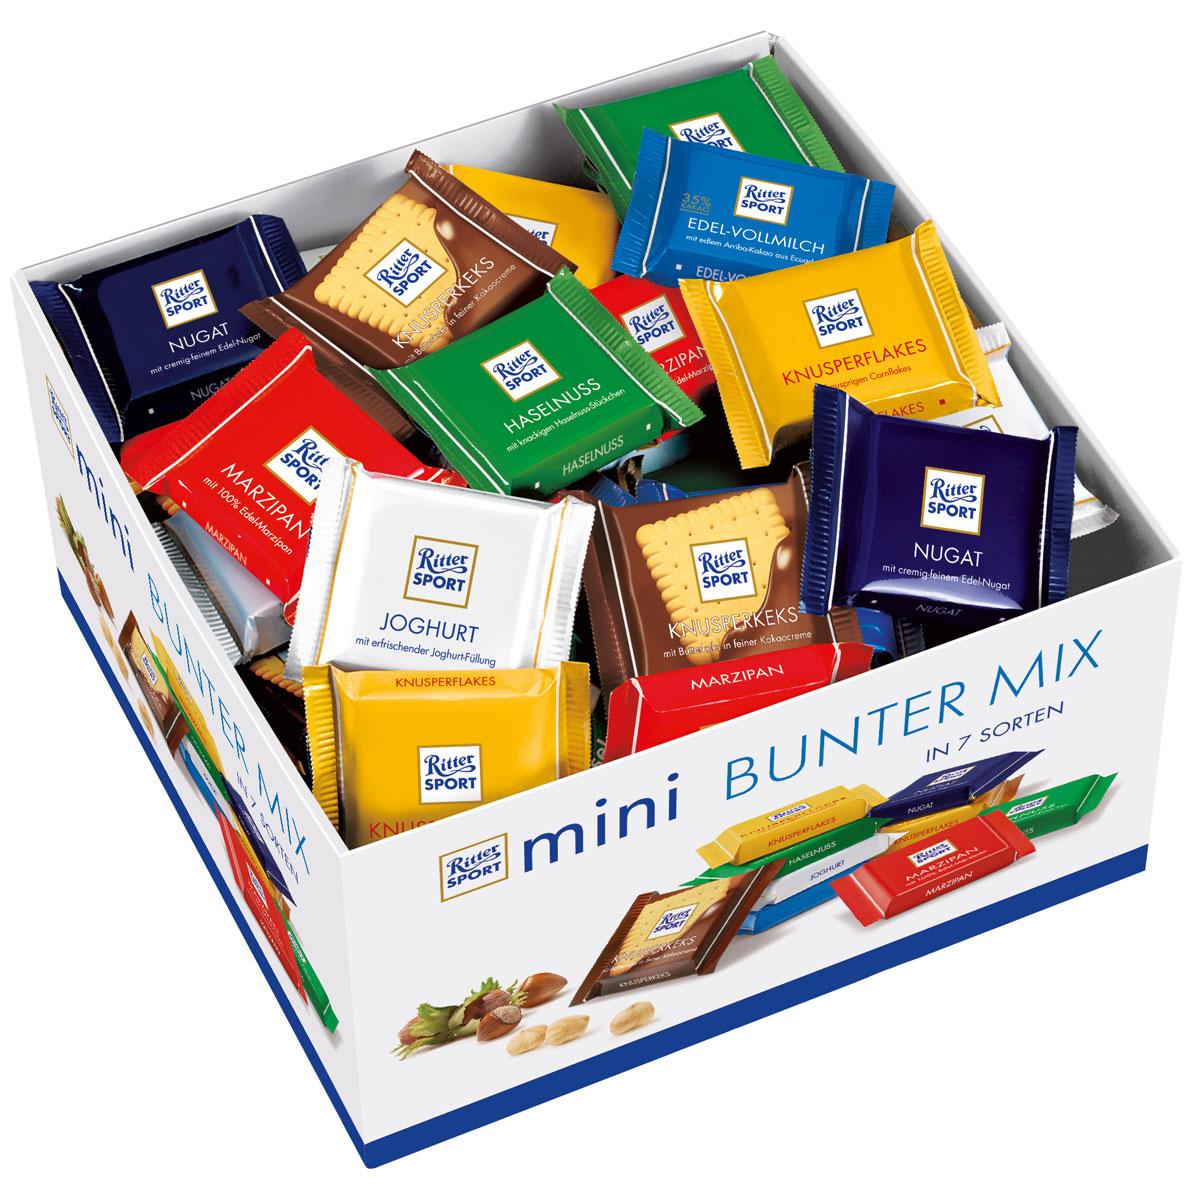 Ritter Sport Яркая Коллекция набор мини-шоколада 7 вкусов, 1400 г prestige печенье с пралине 134 г